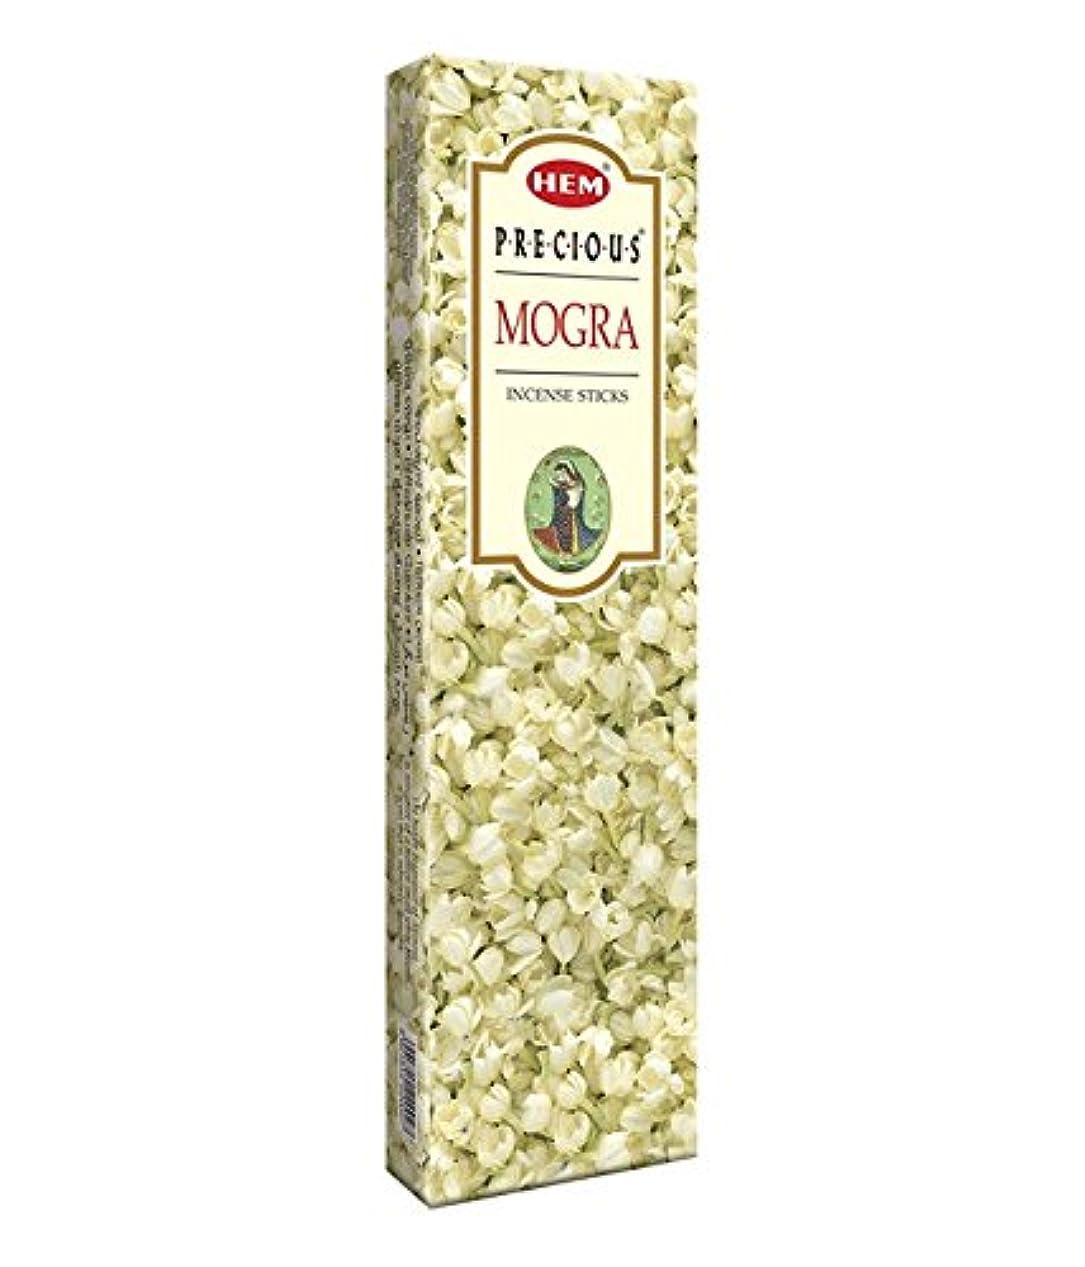 薬理学使用法標準Agarbathi Fragrance Hem Precious Mogra 100 g INCENSE STICKS